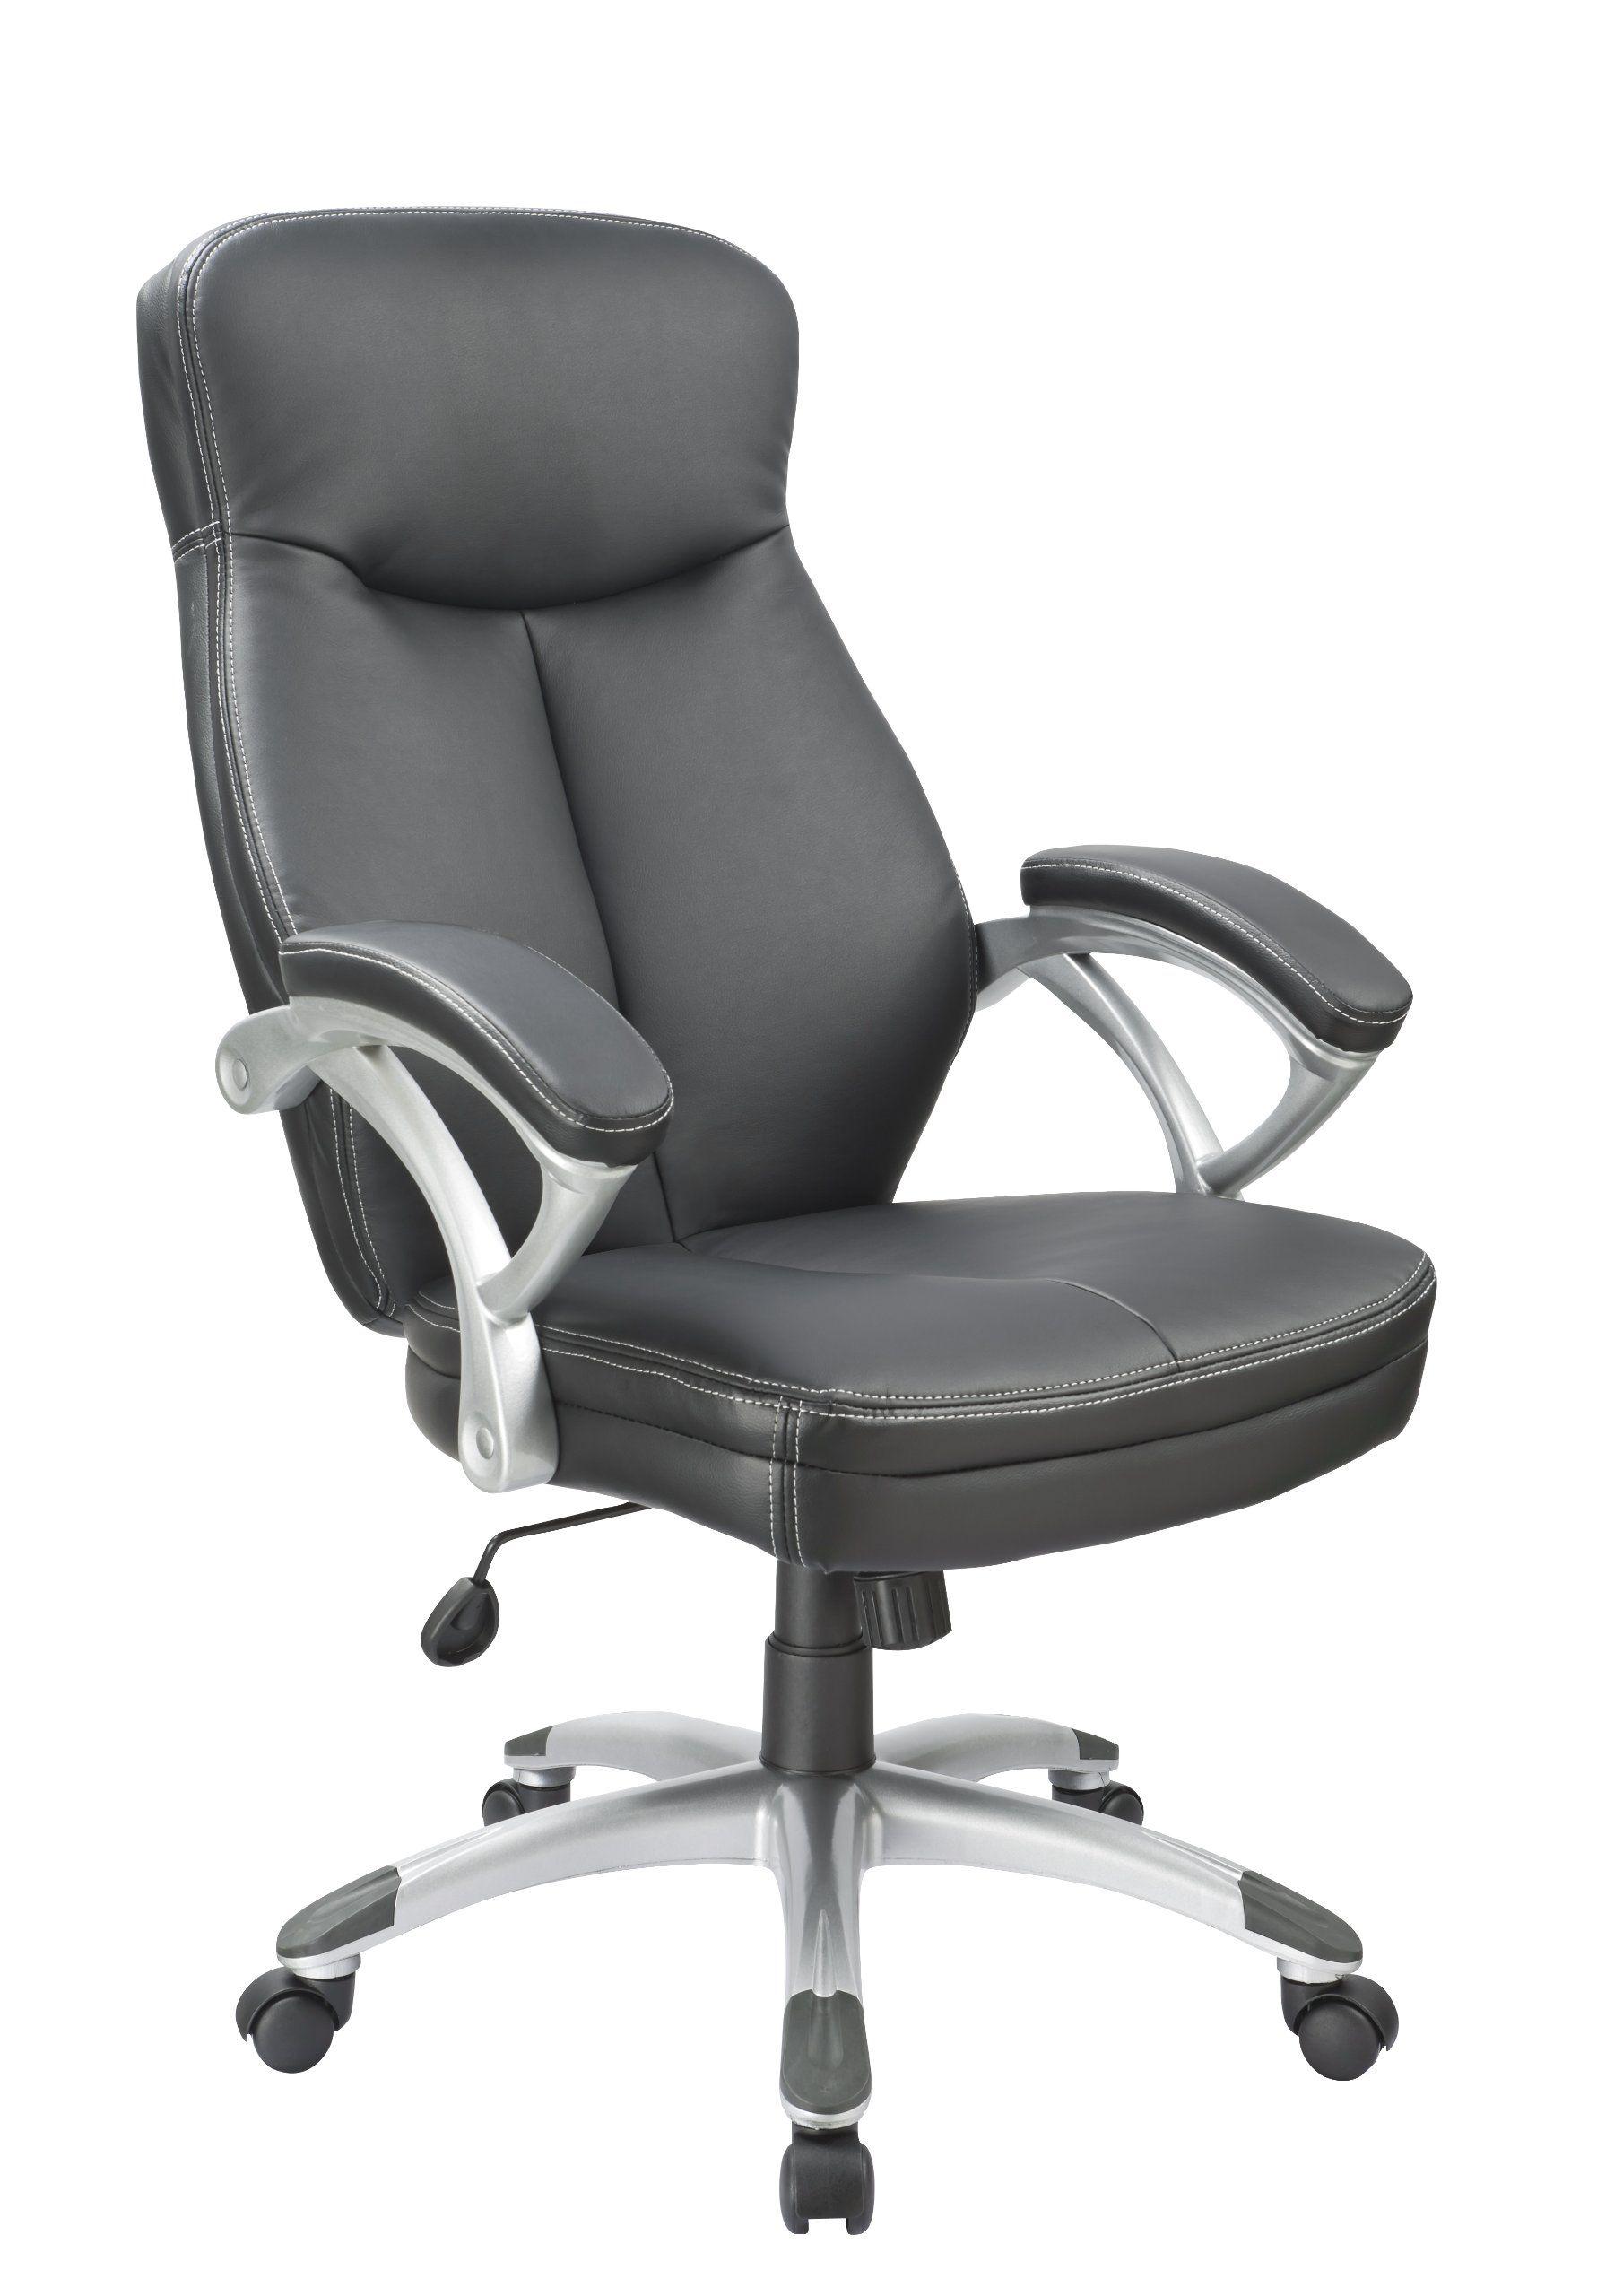 Office Factor High Back Ergonomic Executive Chair